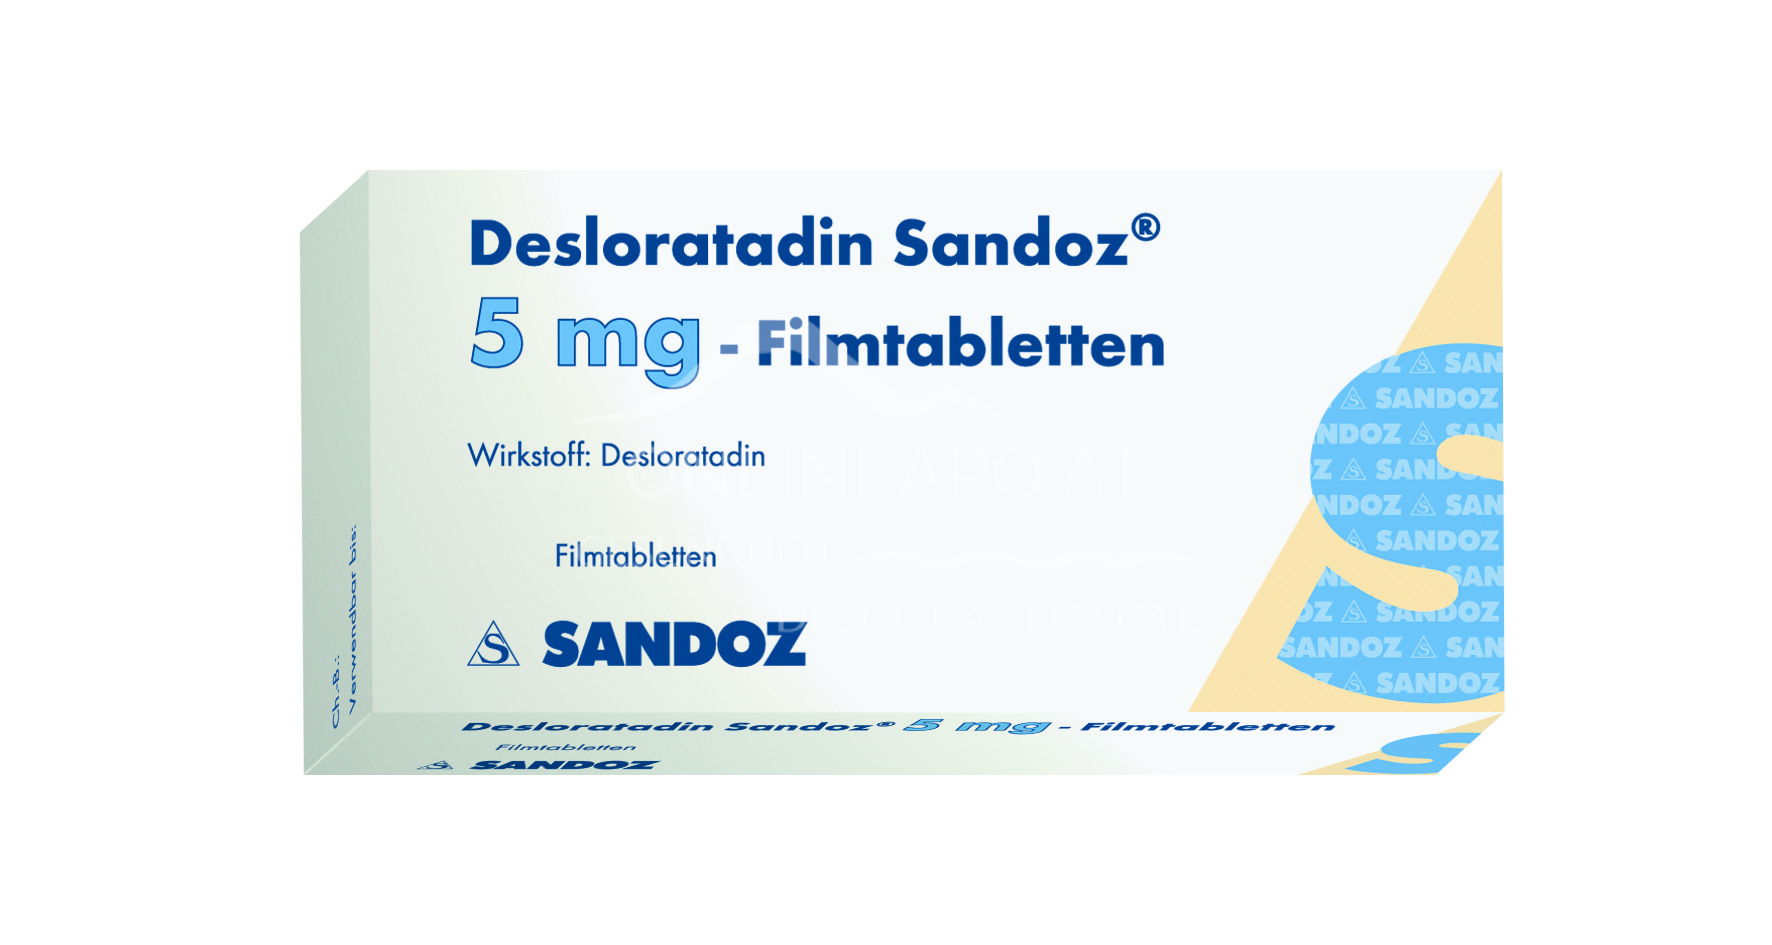 Desloratadin Sandoz Filmtabletten 5mg